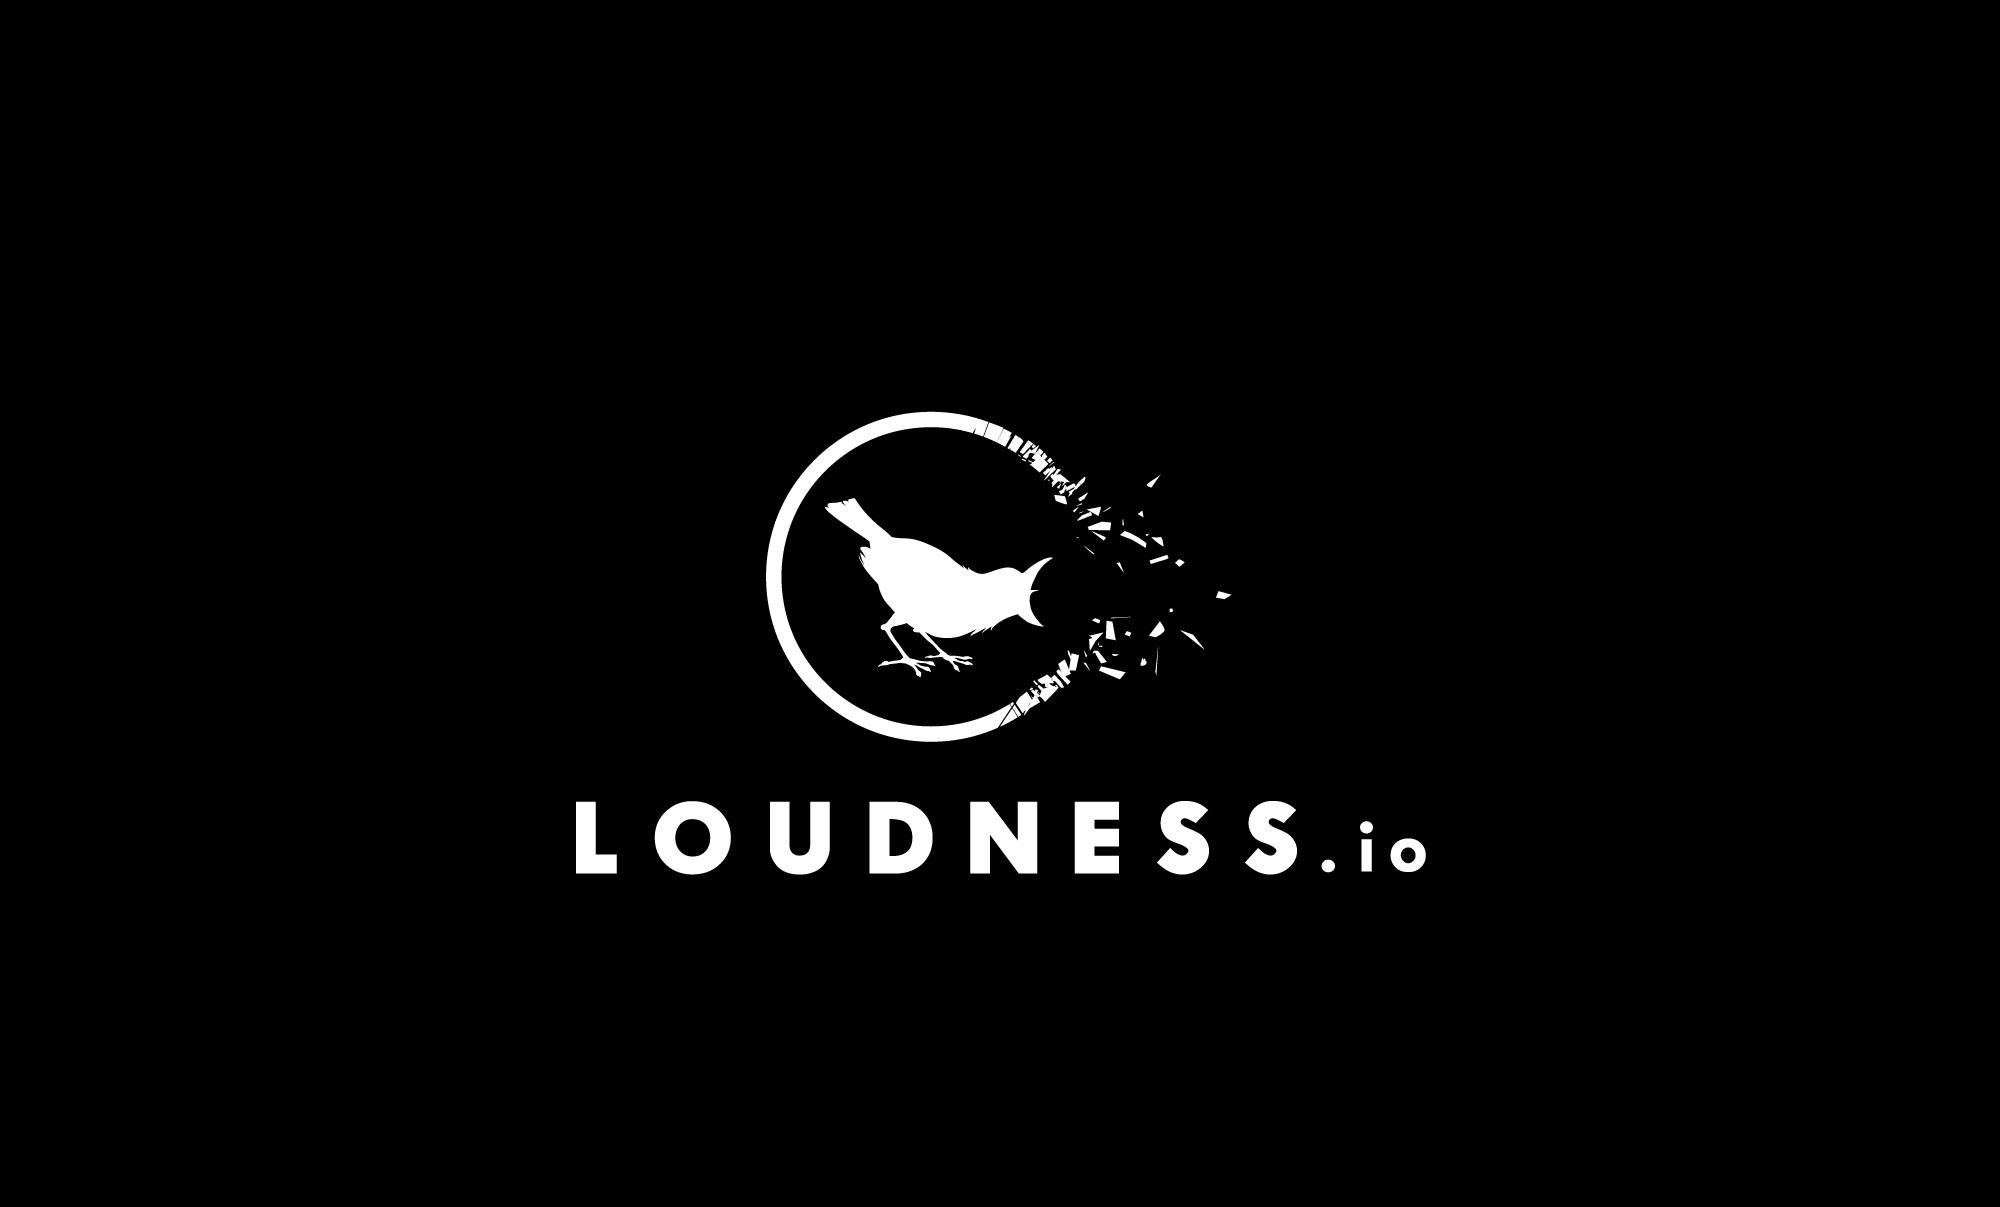 Loudness logo